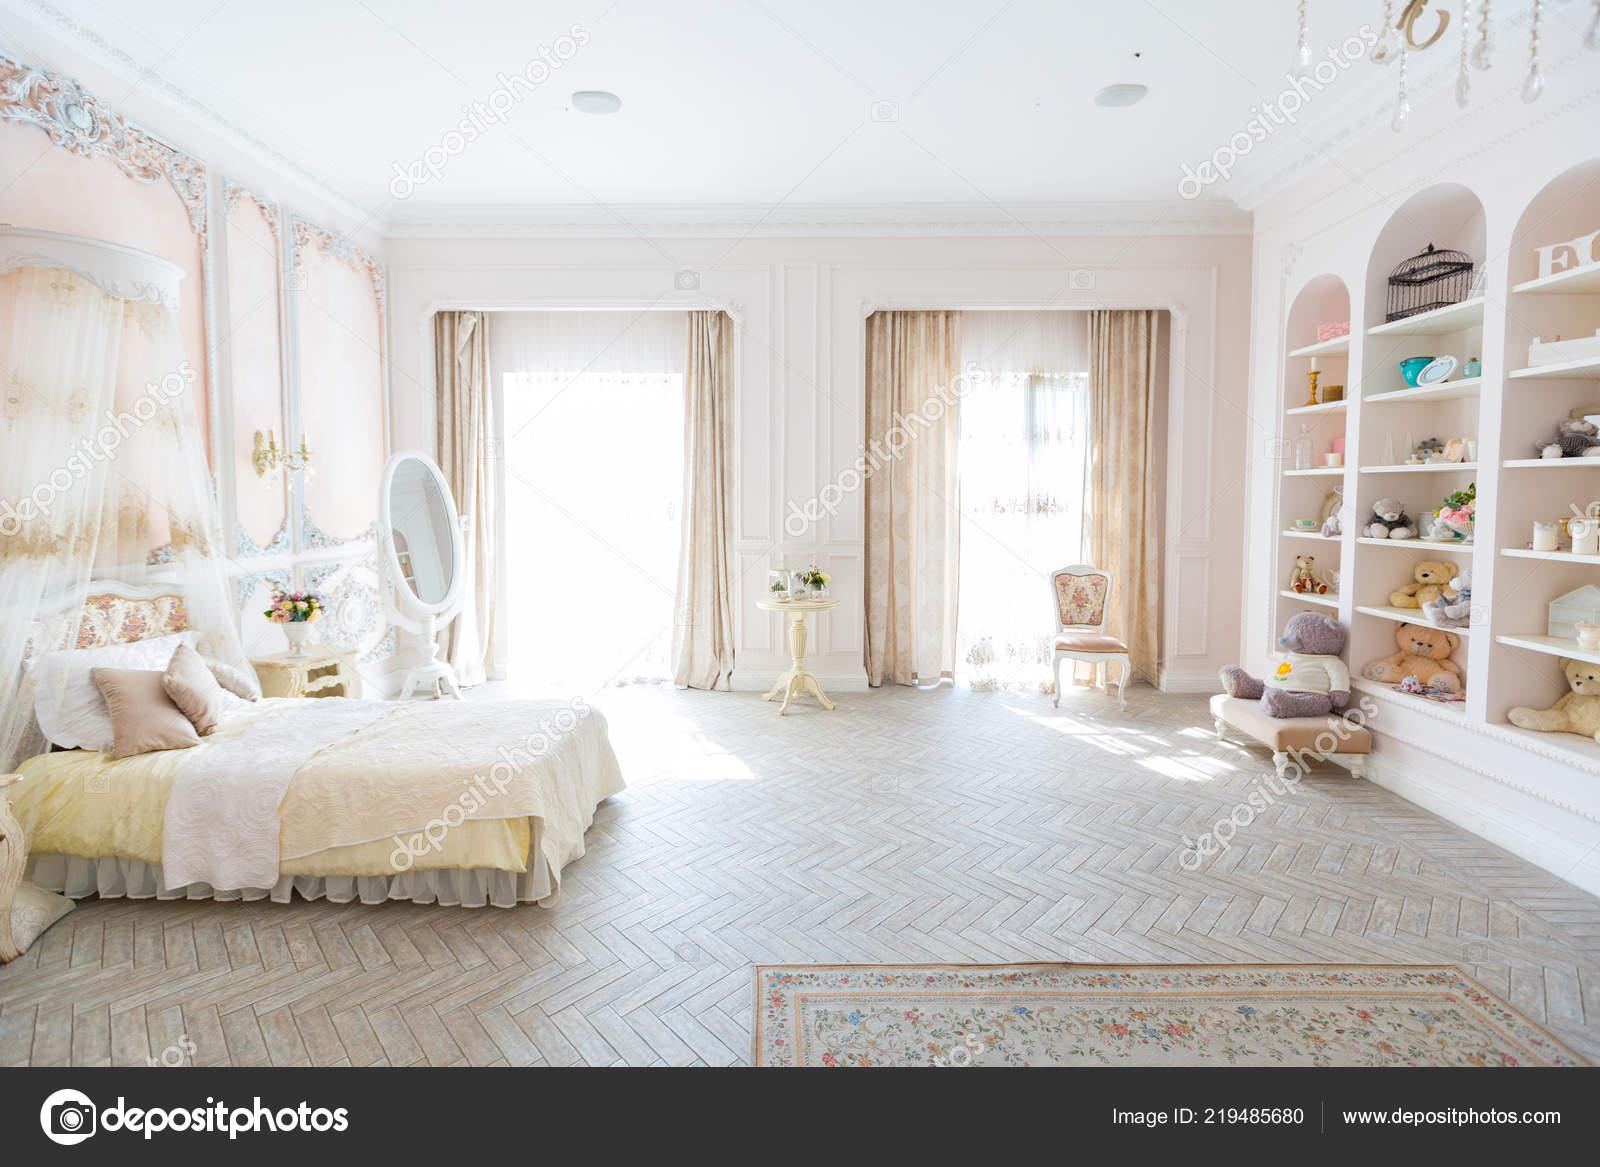 Vintage Baby Bedroom Interior Design Light Furniture Stock Photo Image By C Nokia Alexnet 219485680